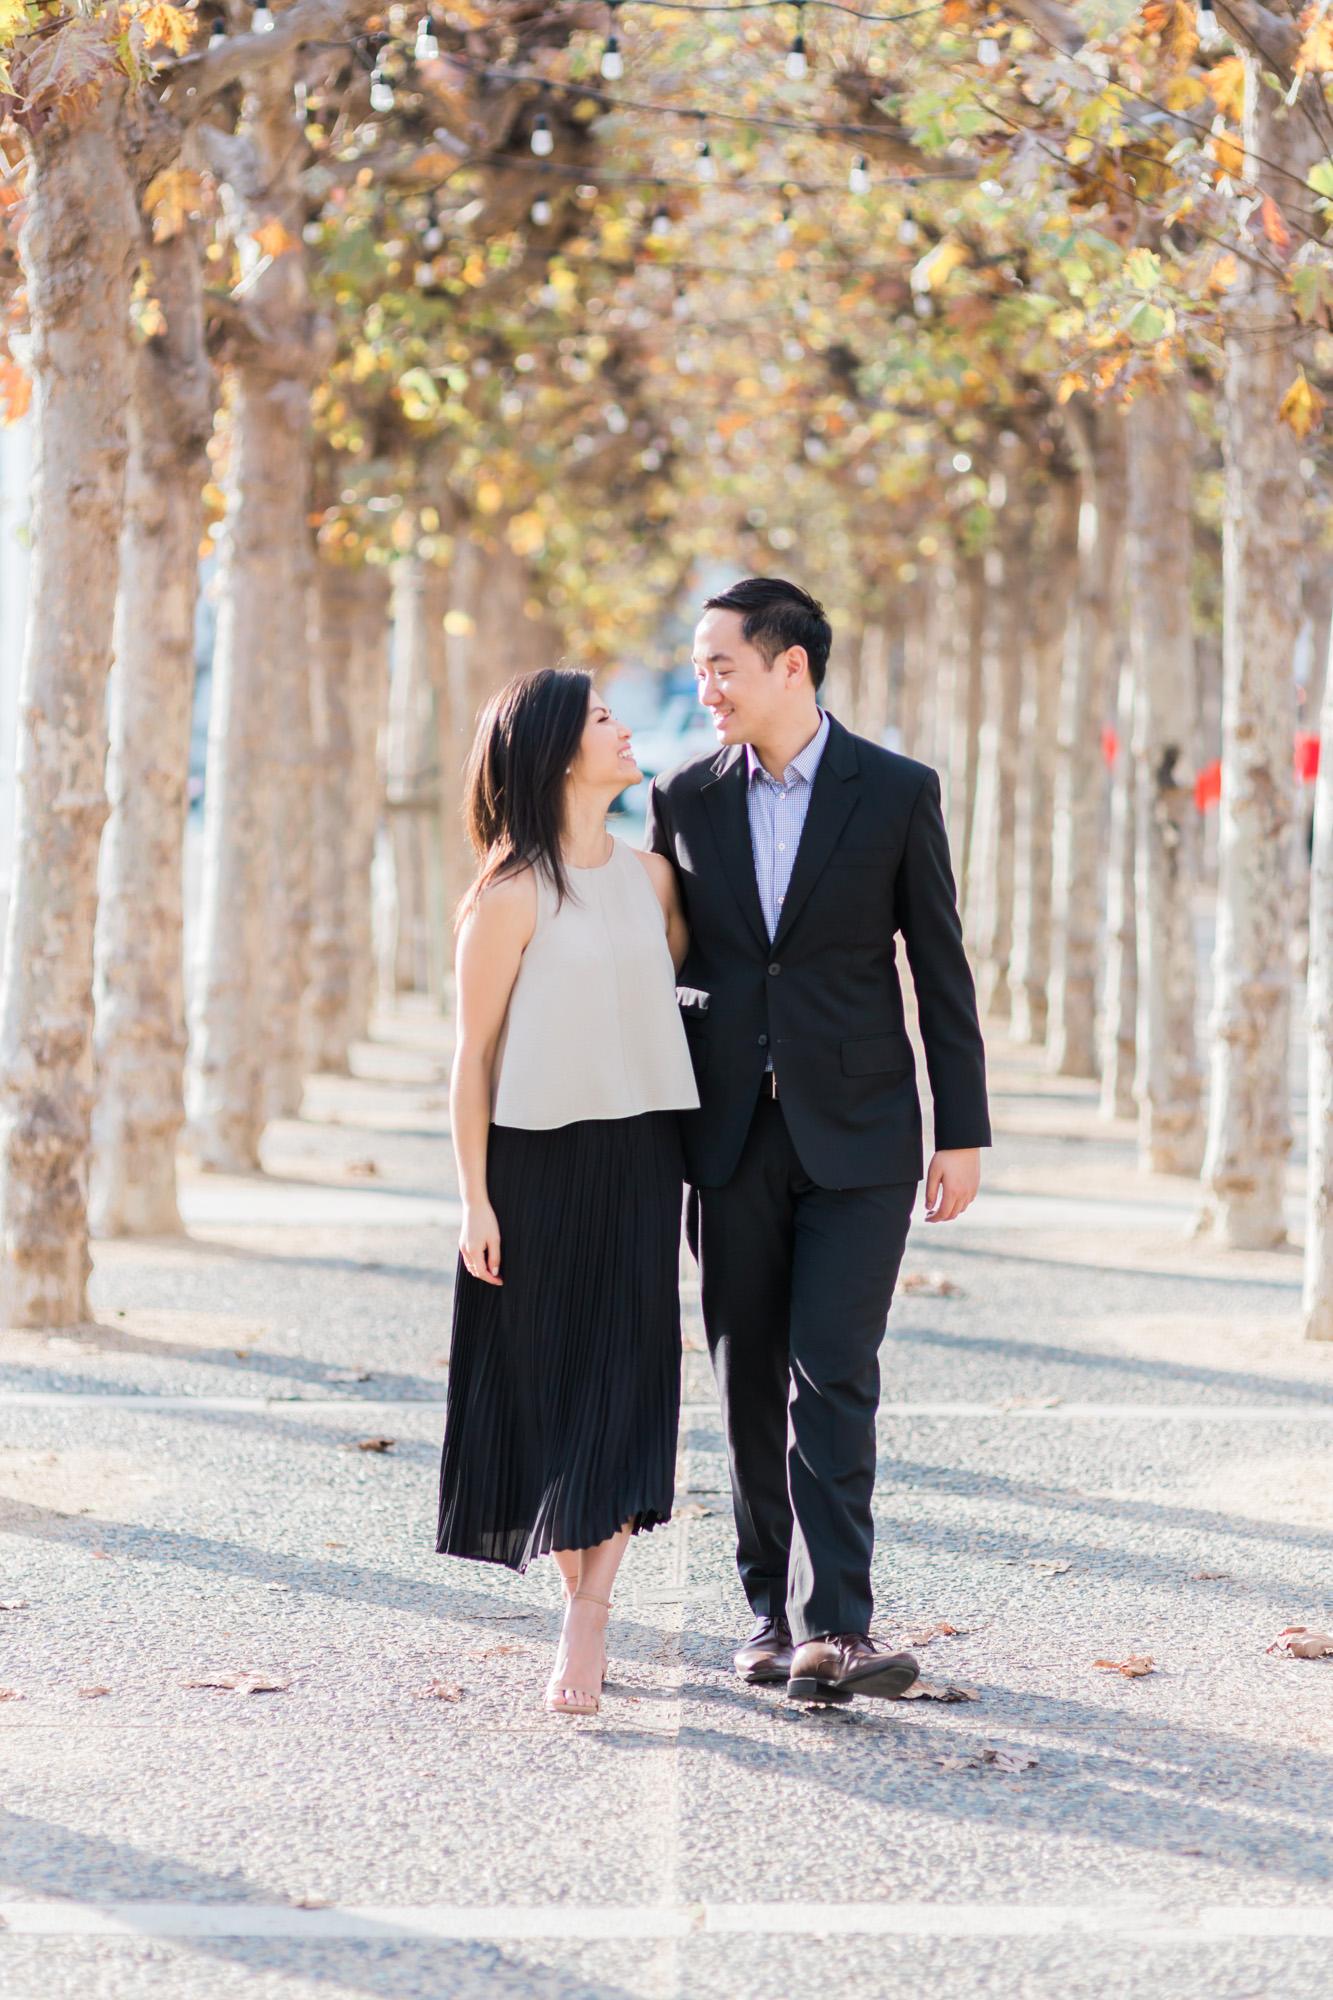 joeewong-jaal-california-san-francisco-engagement-18